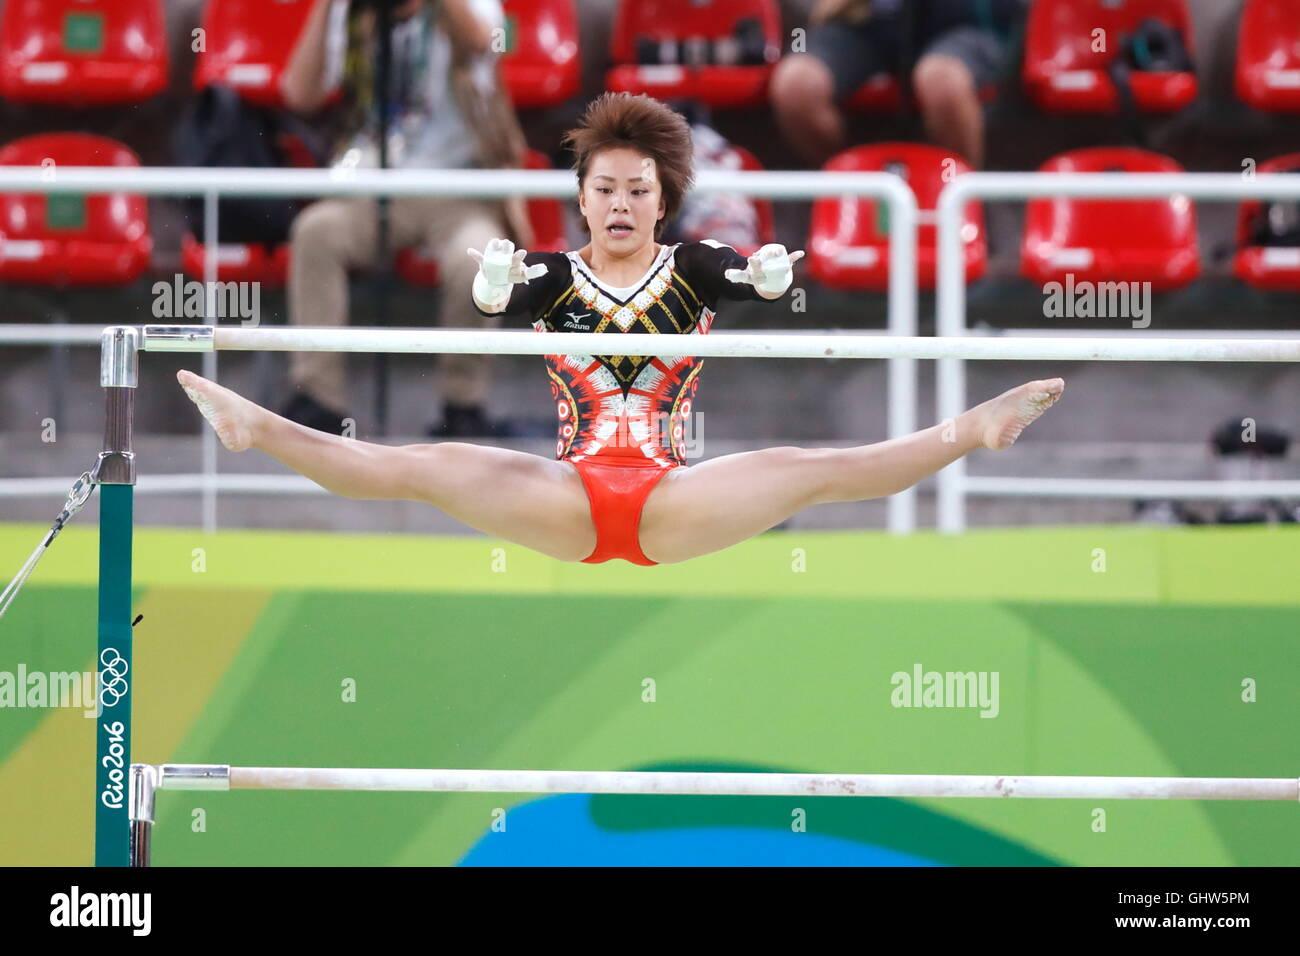 Río de Janeiro, Brasil. 11 Aug, 2016. Mai Murakami (JPN) Gimnasia Artística : Mujer íntegra individual Imagen De Stock